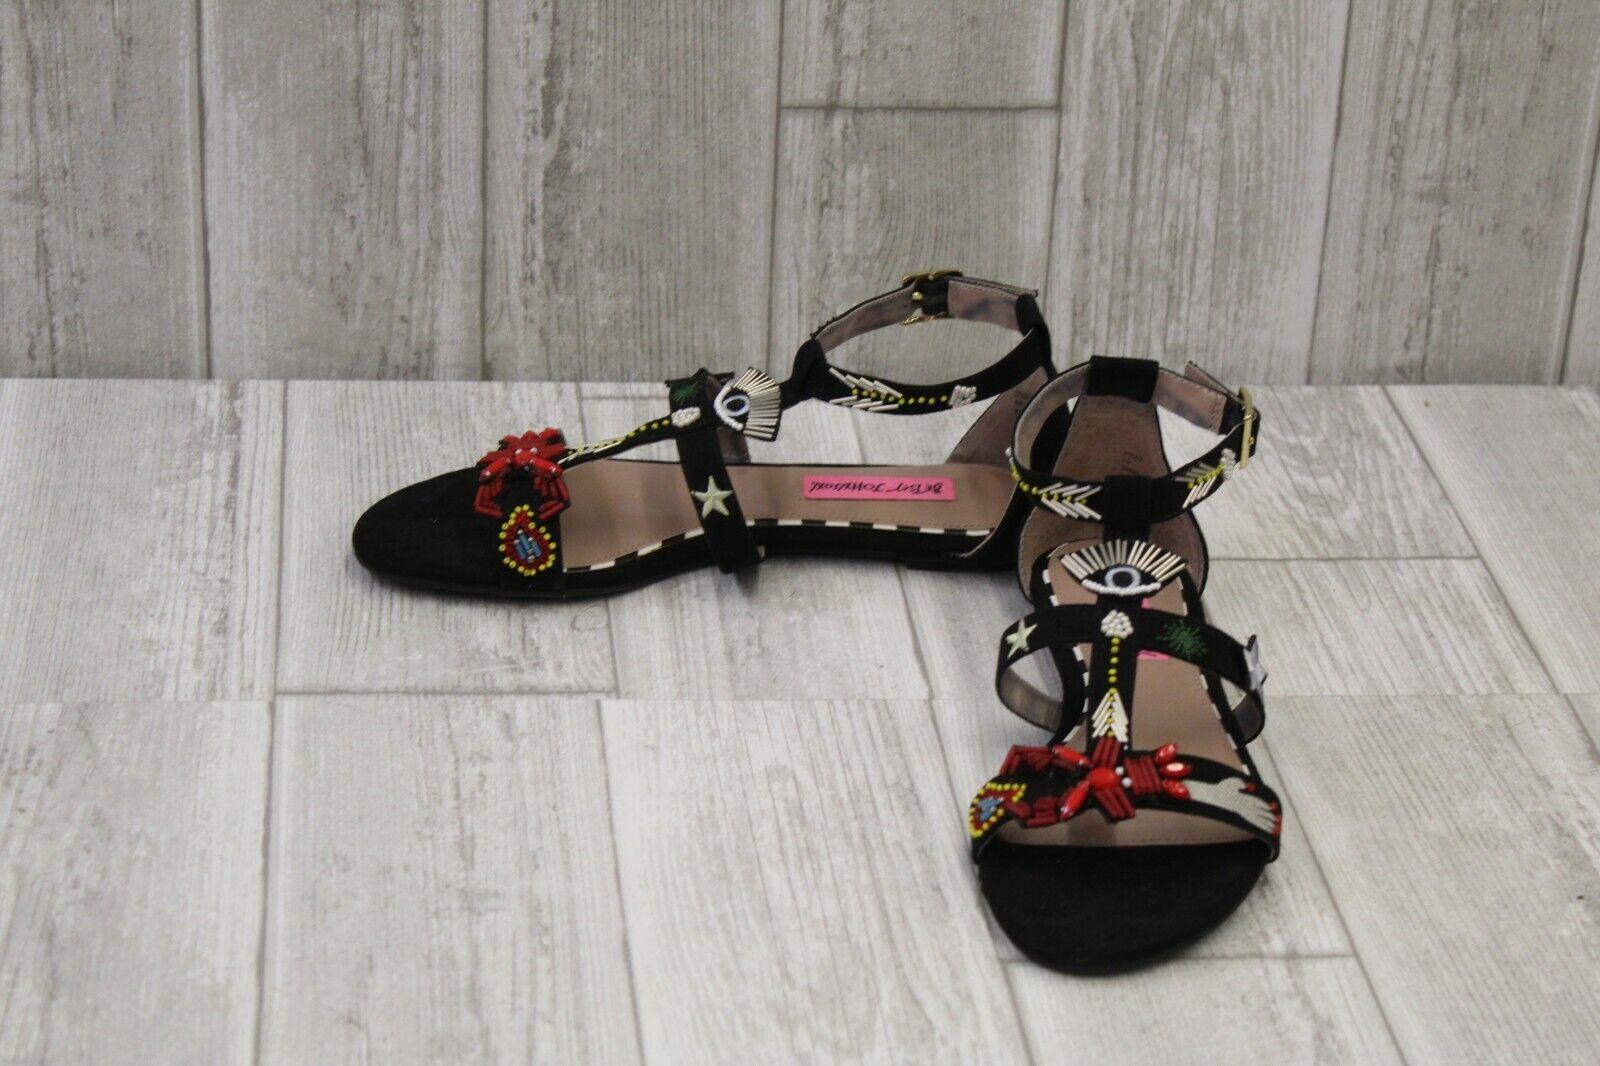 Betsey Johnson Jossy Embellished Flat Sandals, Women's Size 6B, Black